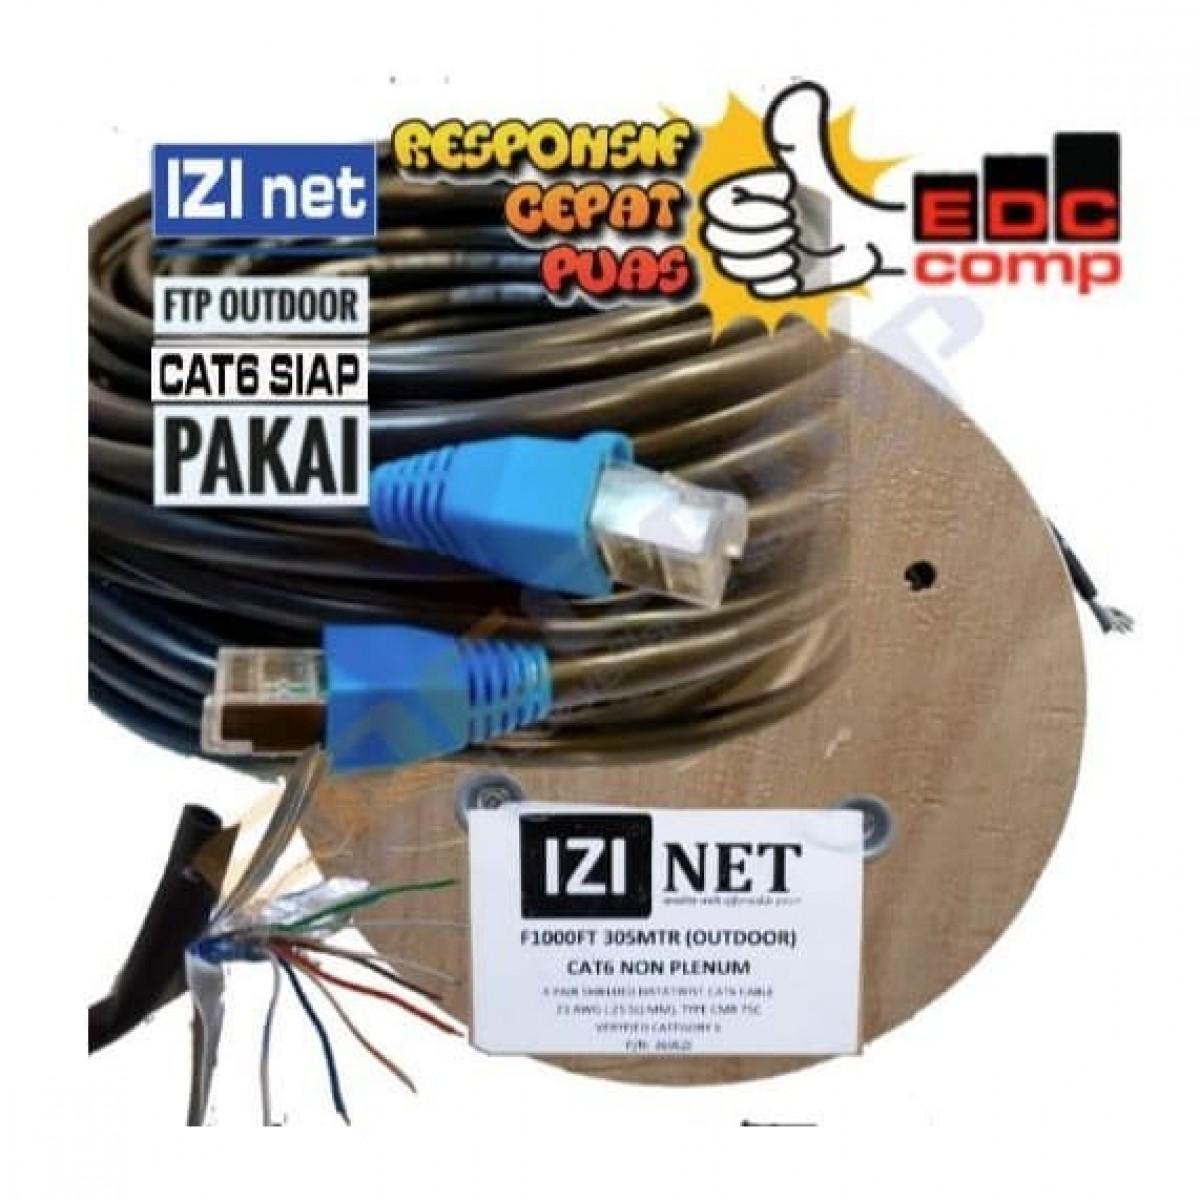 Cable STP/FTP Cat 6 Outdoor Cable 80 Meter IZI net Original - EdcComp